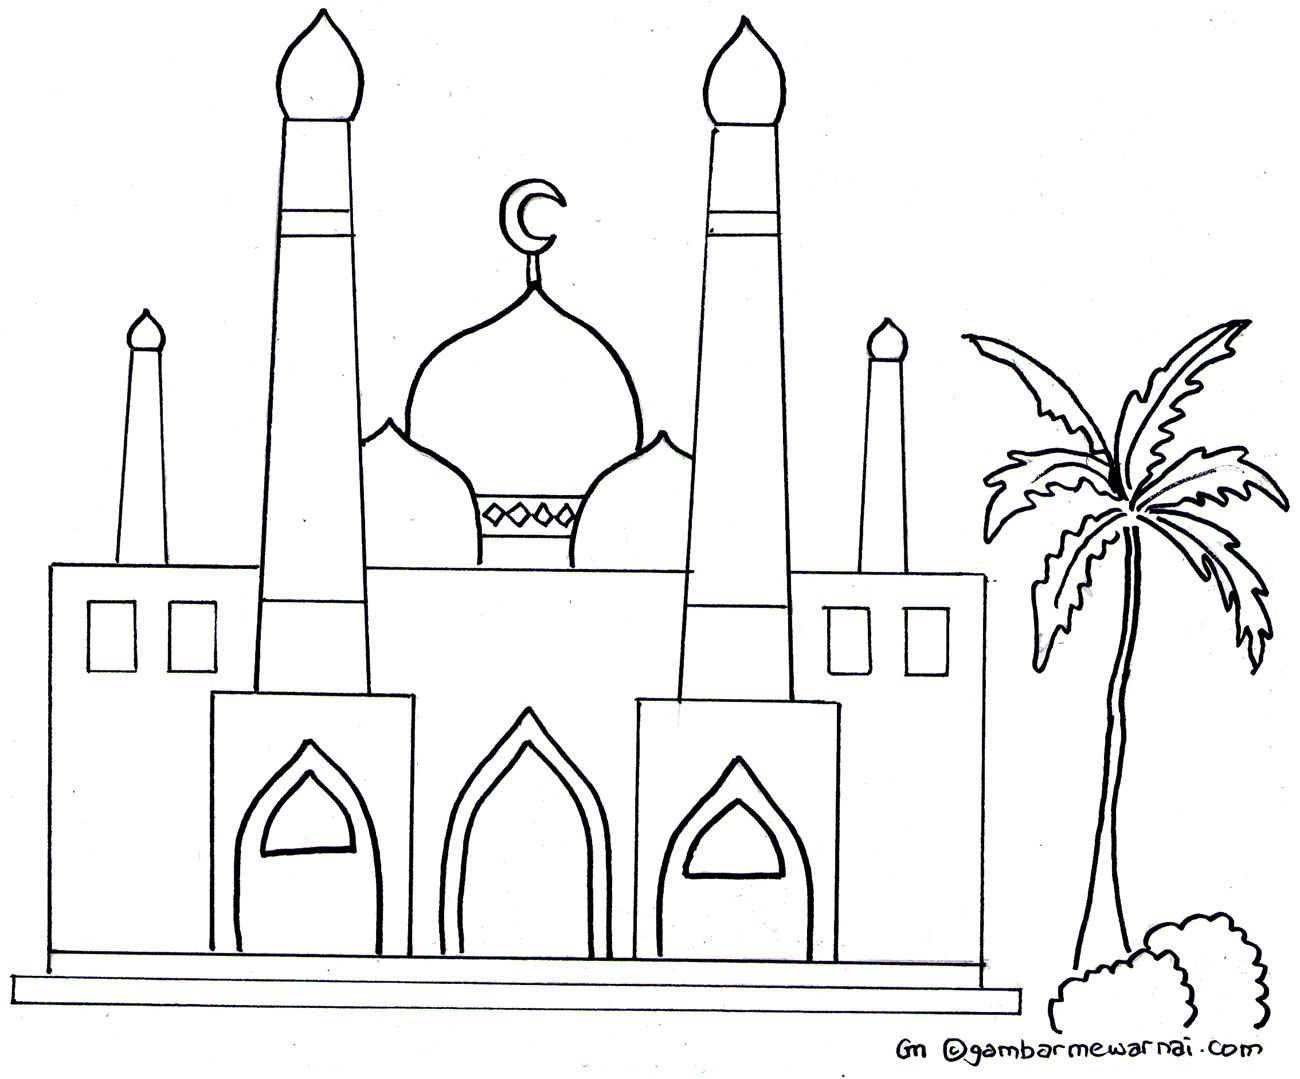 Gambar Mewarnai Masjid Kaligrafi Pinterest Indonesia